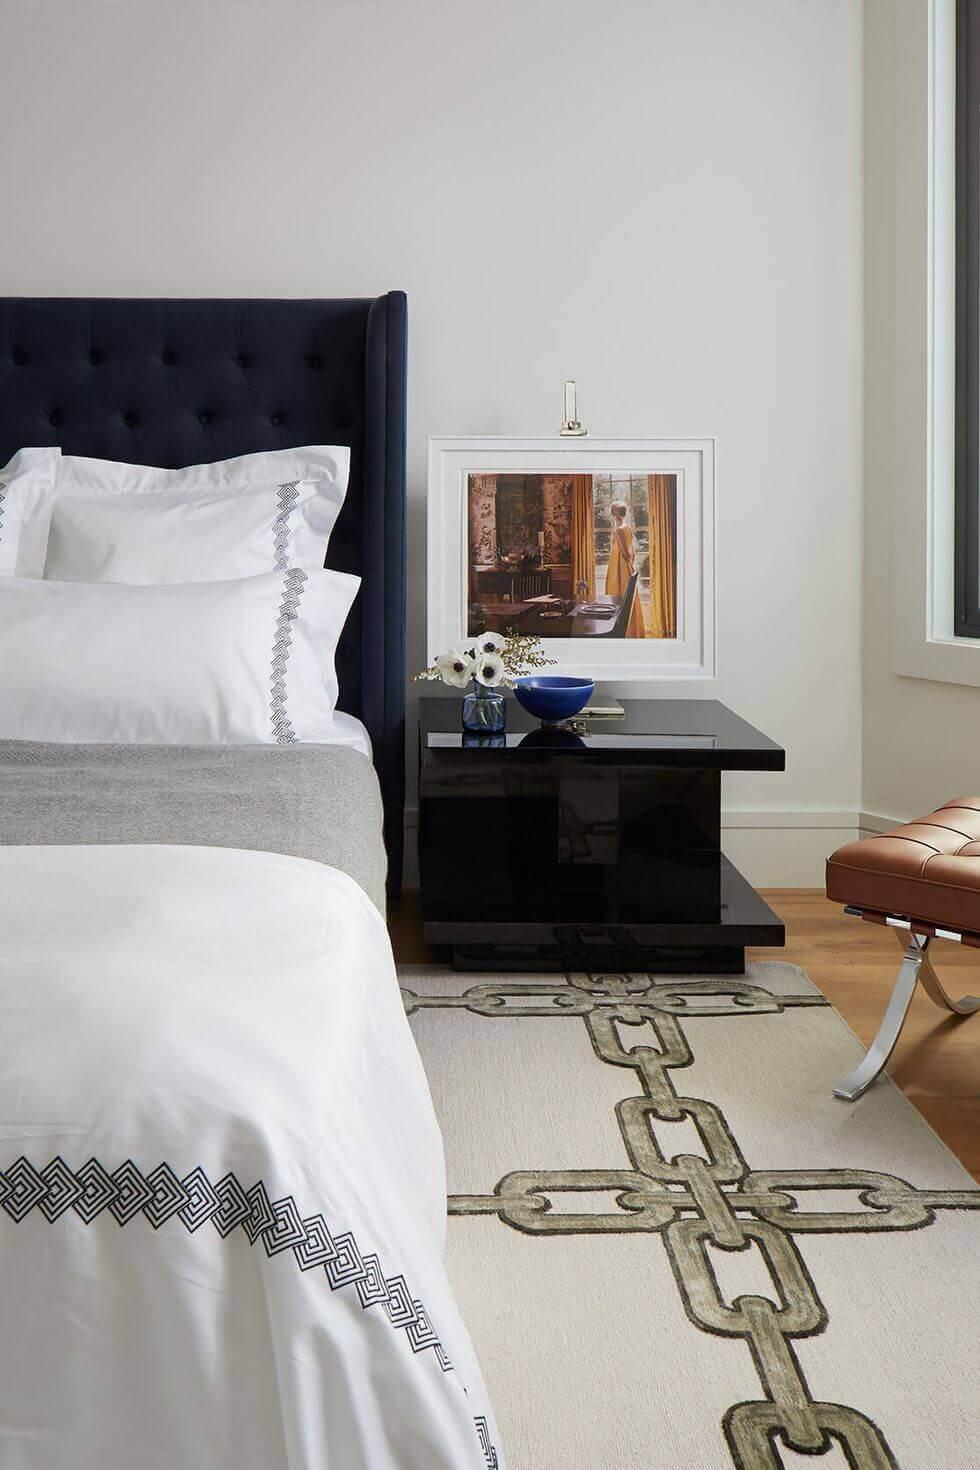 Mens Bedroom Ideas ikea Introduce Interesting Artwork